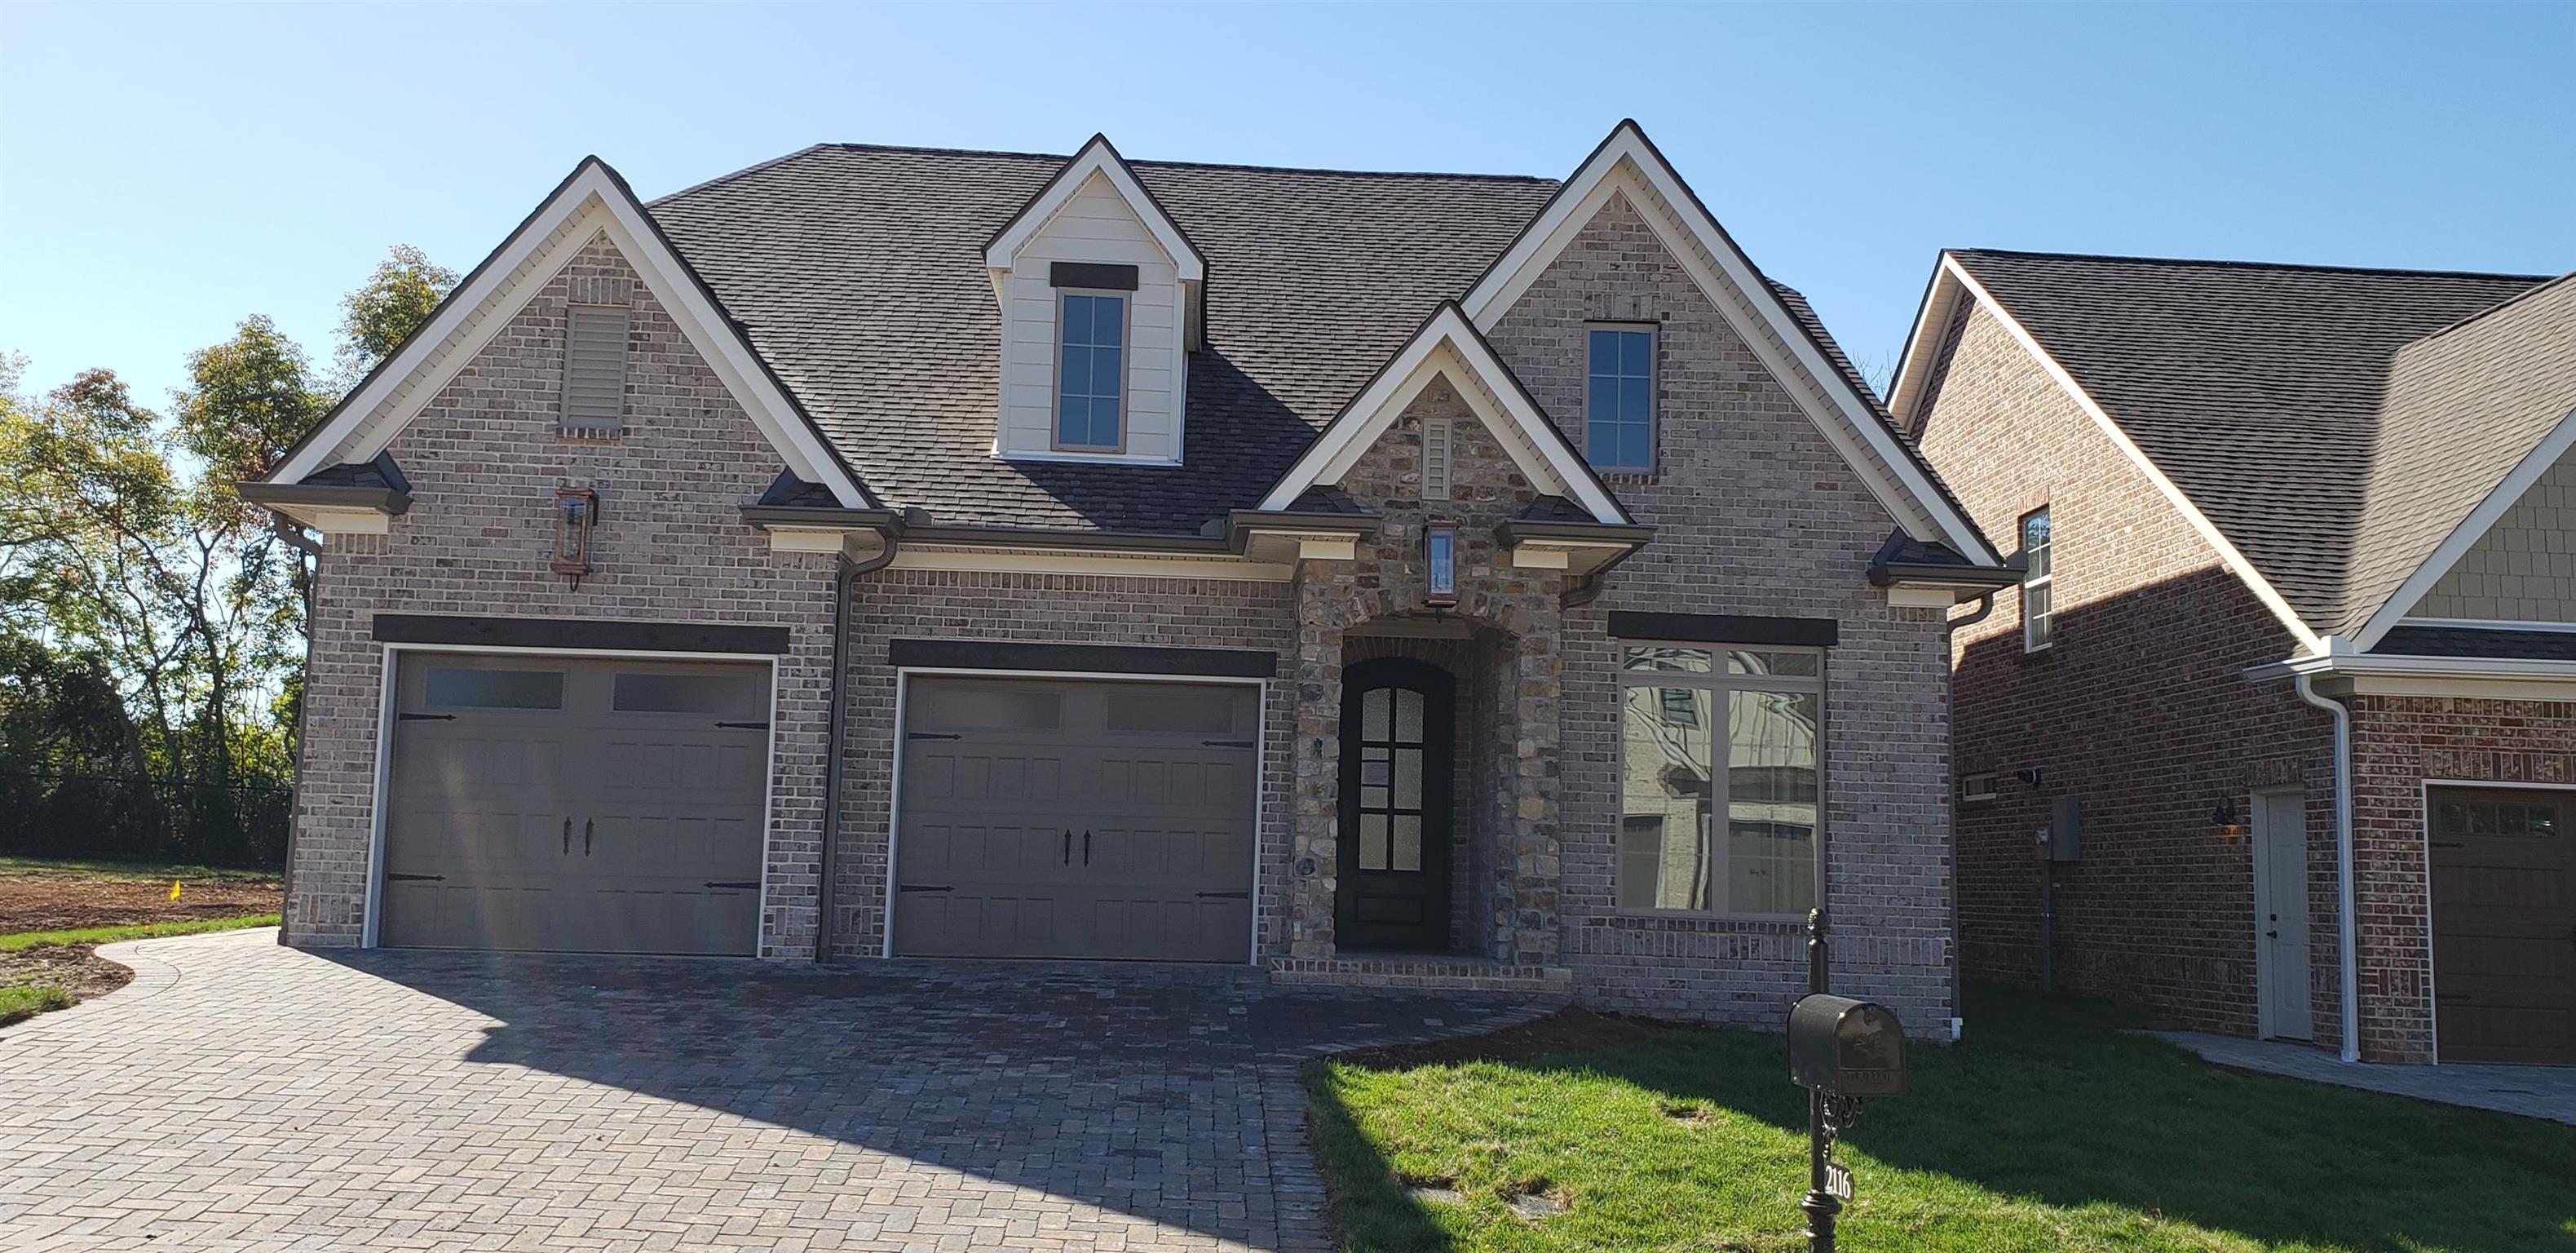 2116 White Poplar Ct, Murfreesboro, TN 37130 - Murfreesboro, TN real estate listing